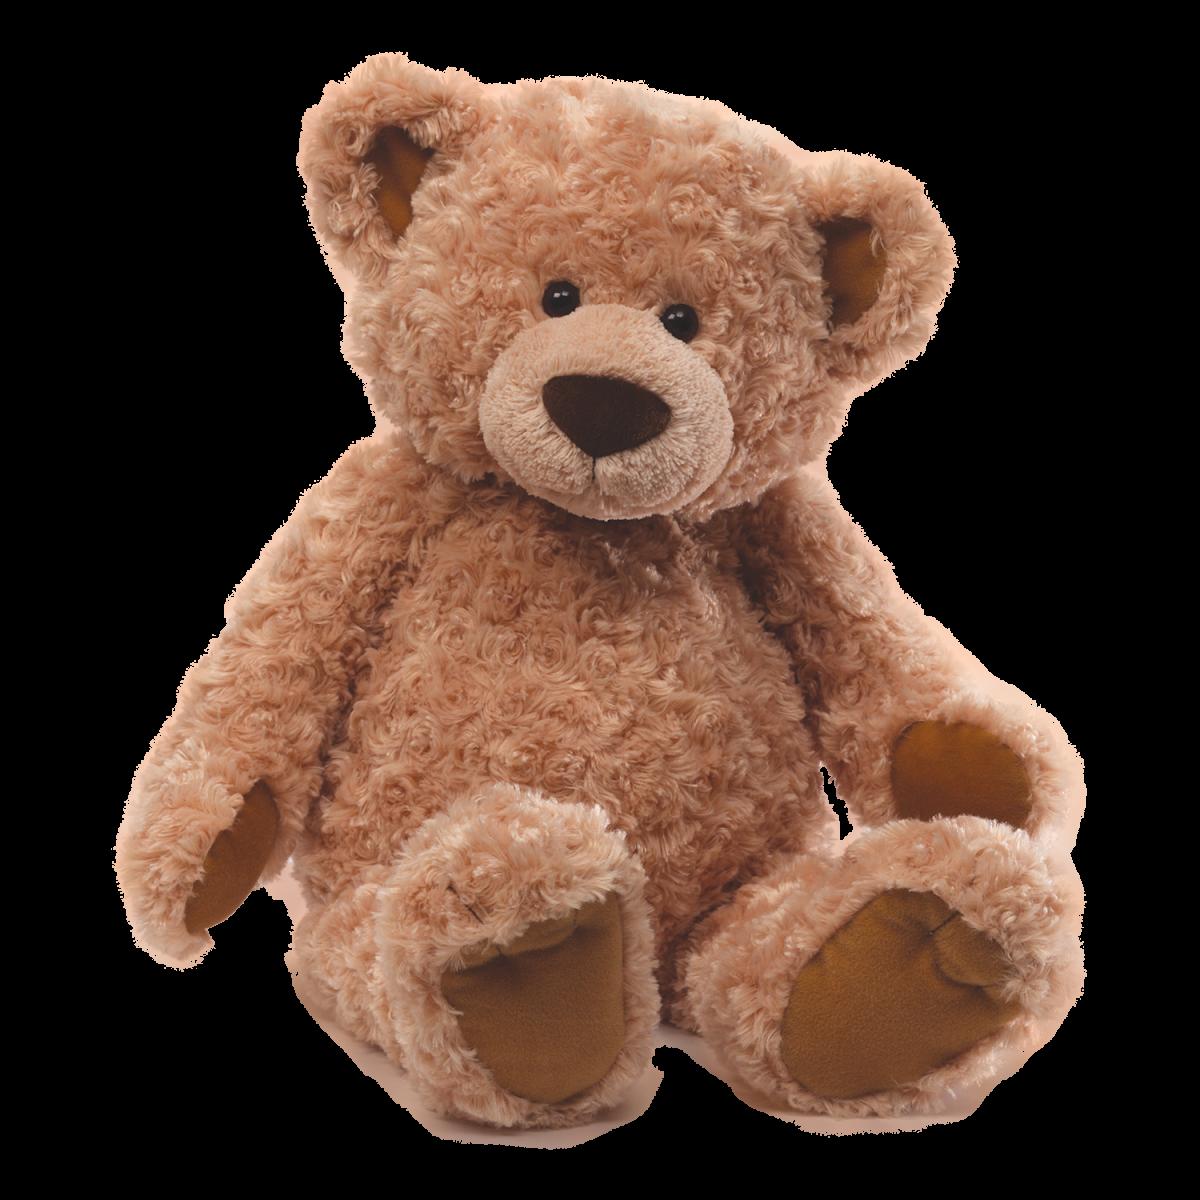 Teddy bear - Toy Bear PNG